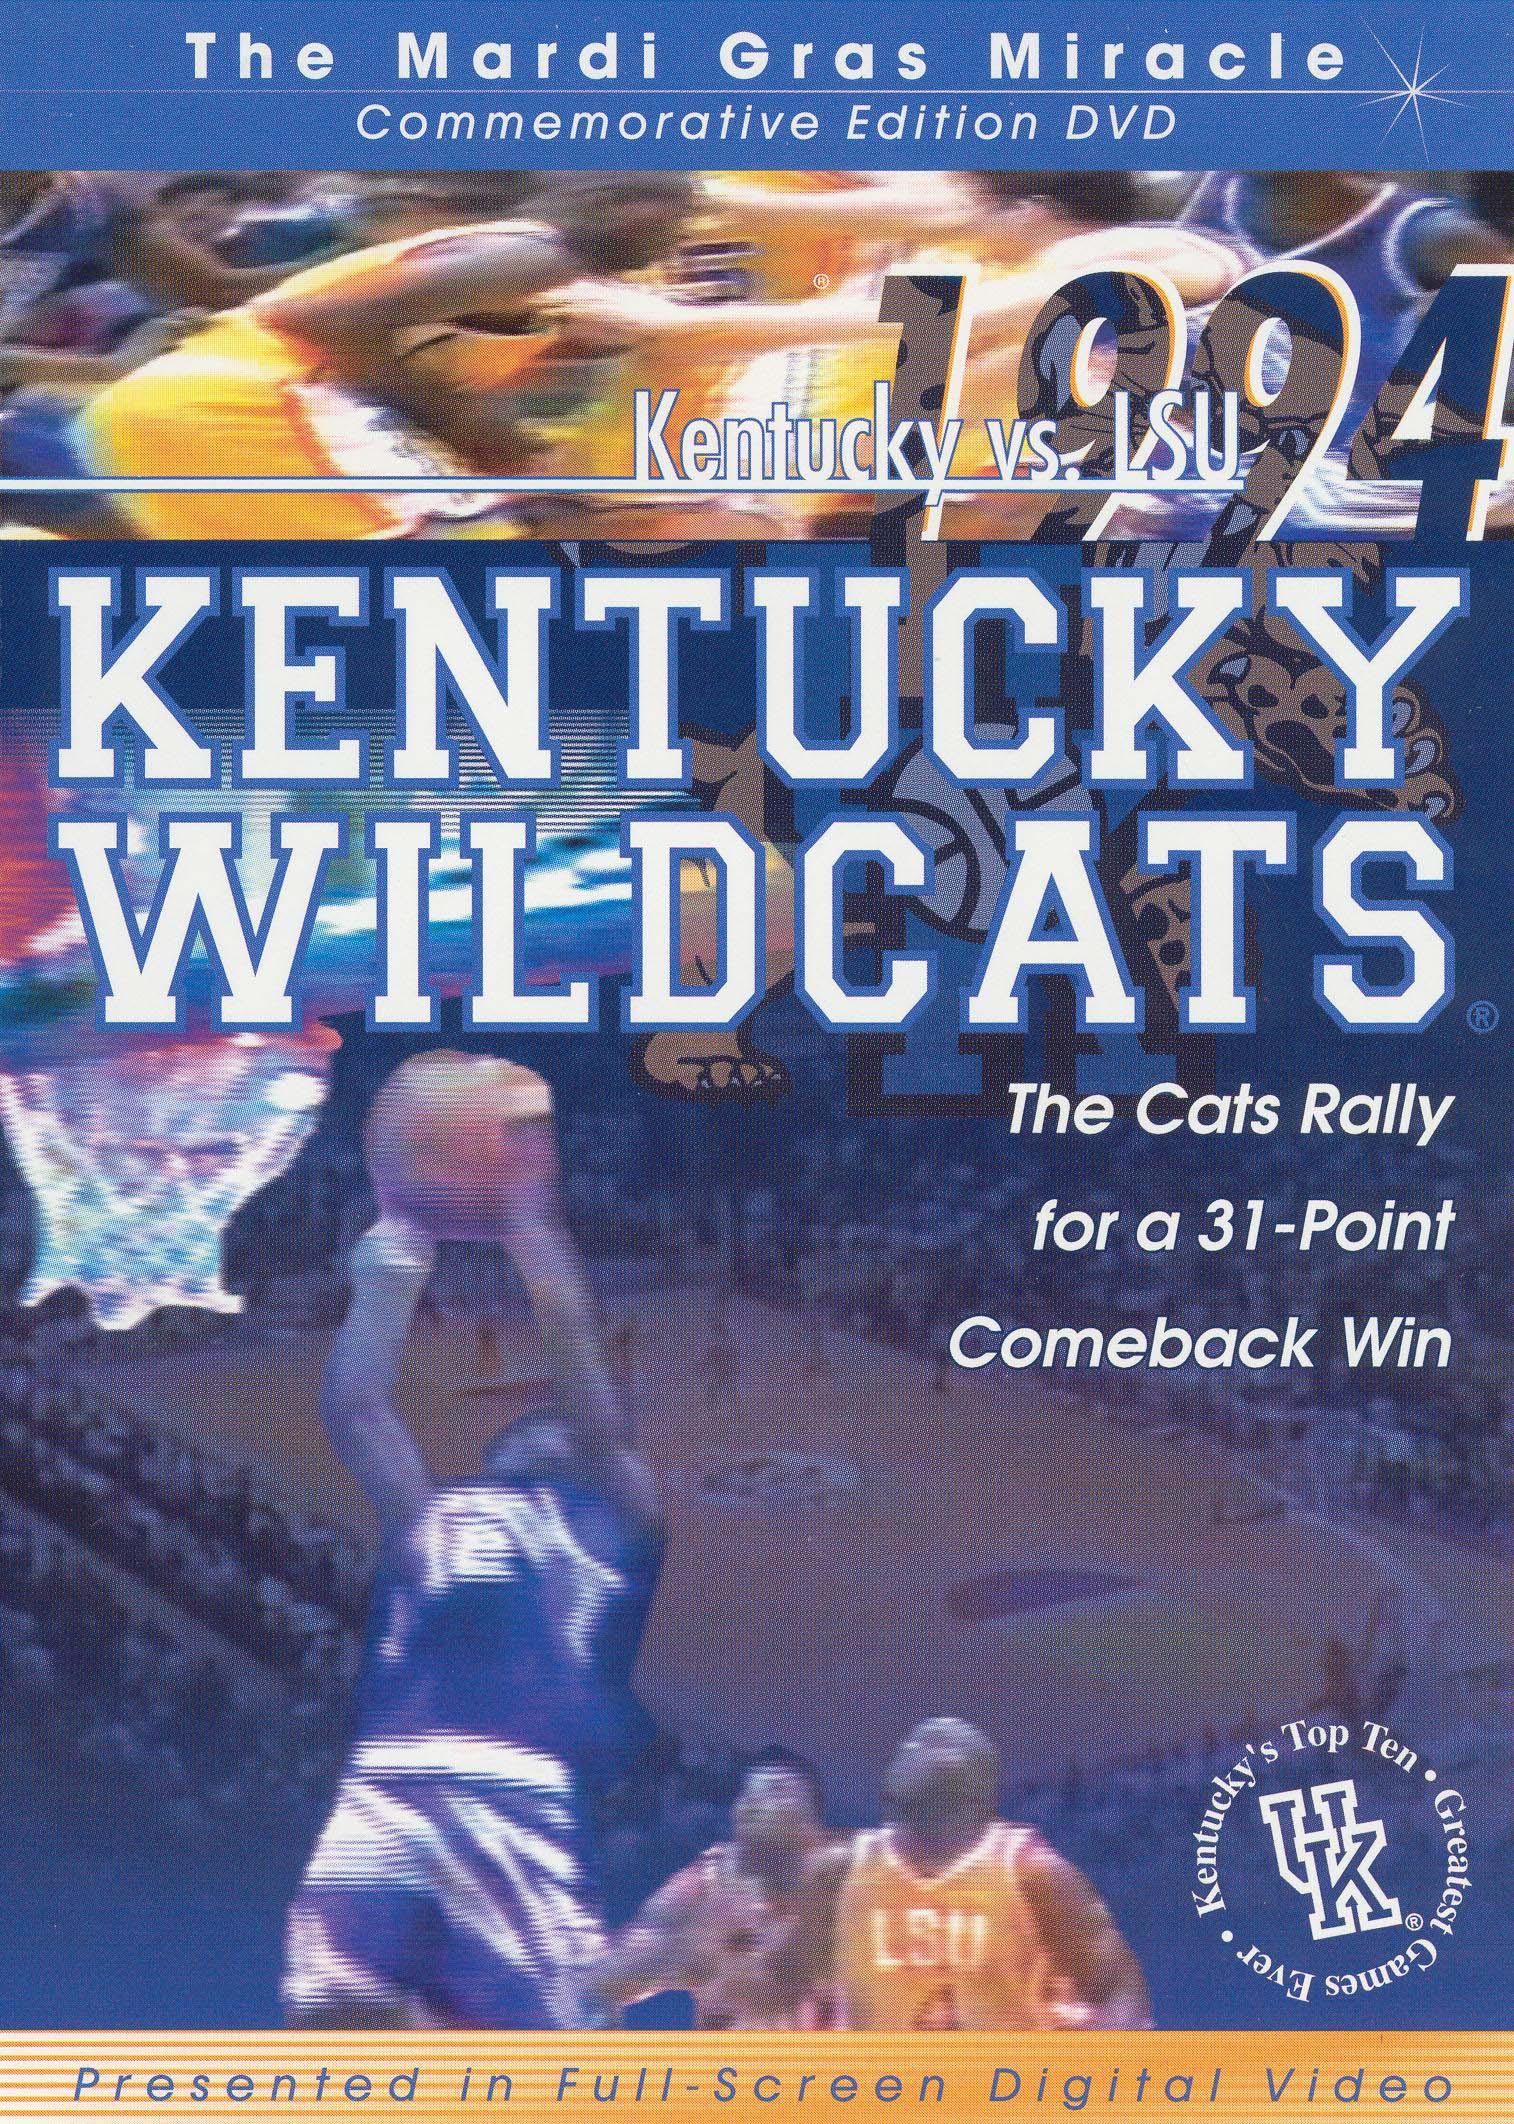 Kentucky Wildcats: The Mardi Gras Miracle